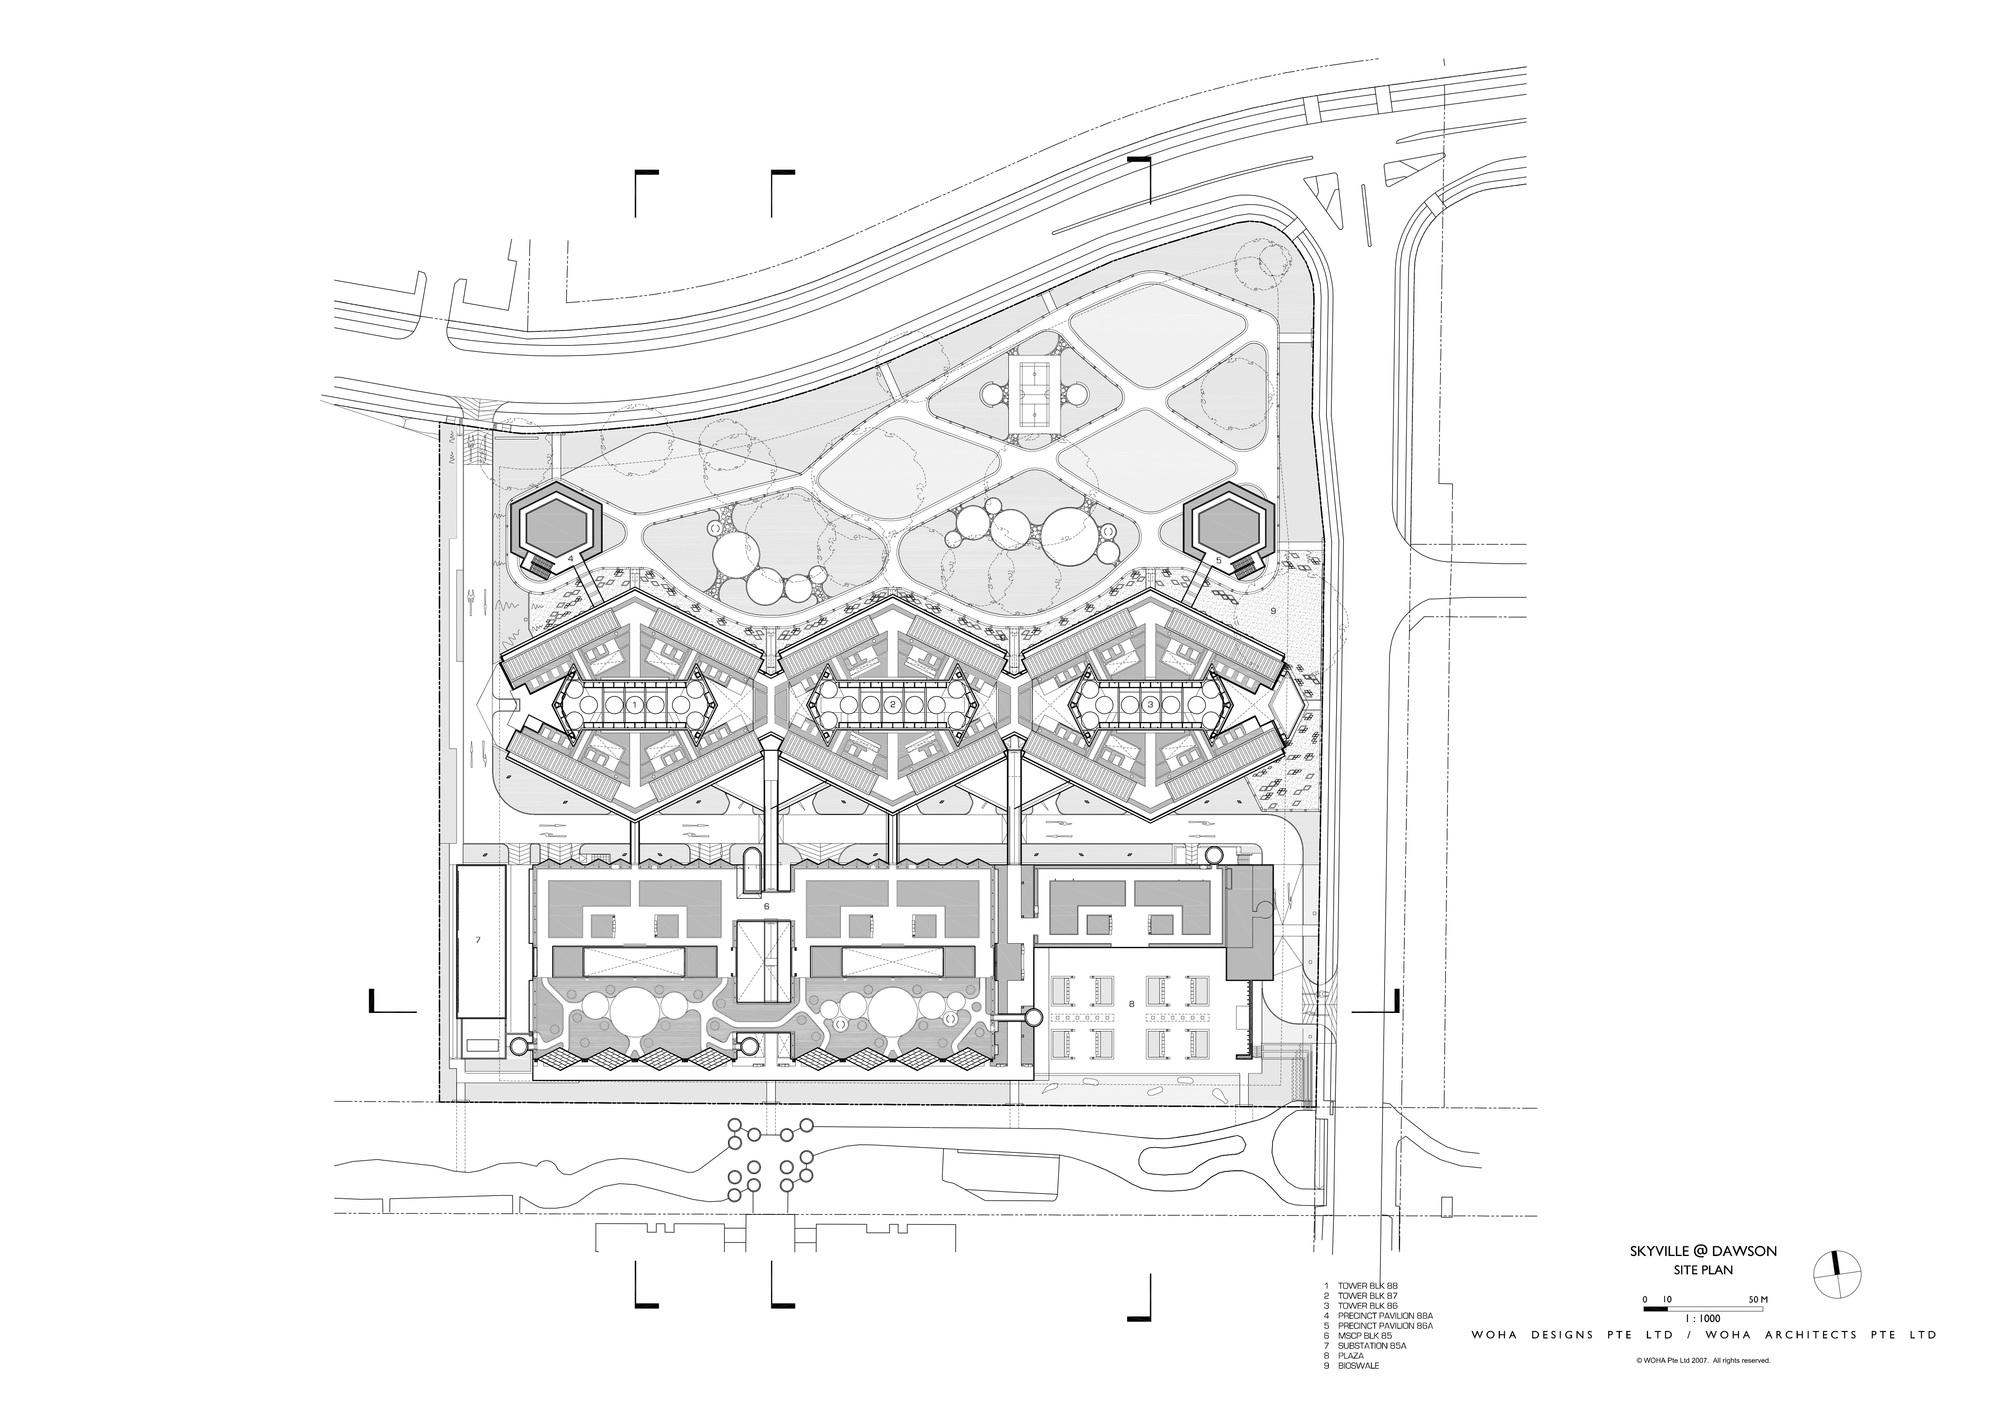 Gallery Of Skyville Woha 14 Webasto Wiring Diagram Zoom Image View Original Size